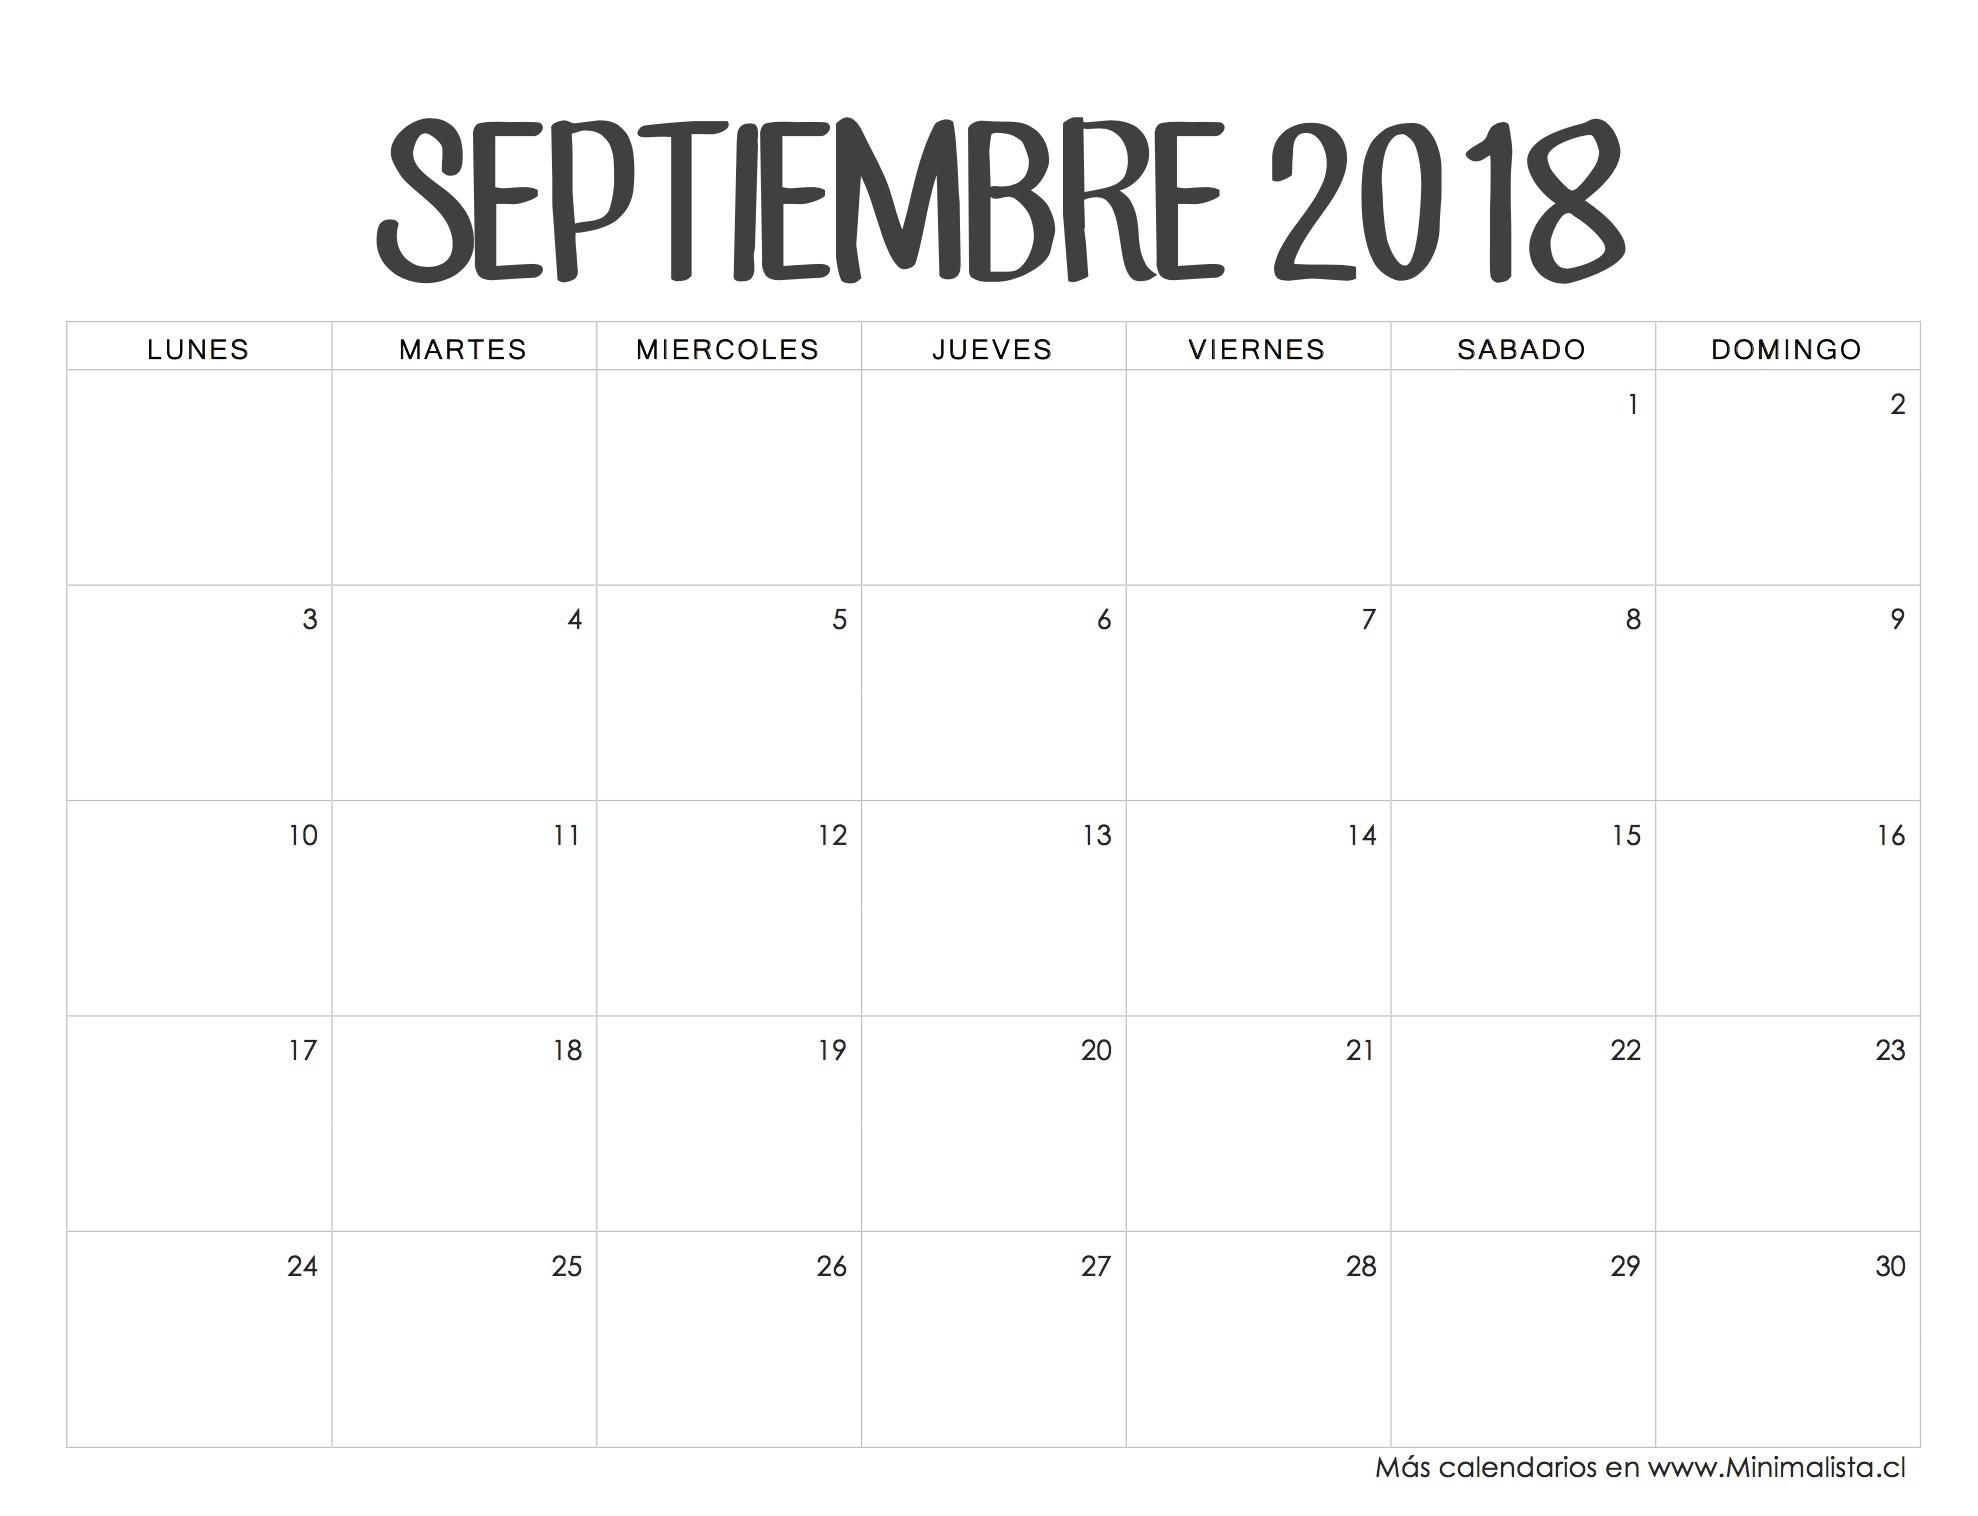 imprimir calendario semanal julio 2019 actual calendario septiembre 2018 ideas para mi agenda of imprimir calendario semanal julio 2019